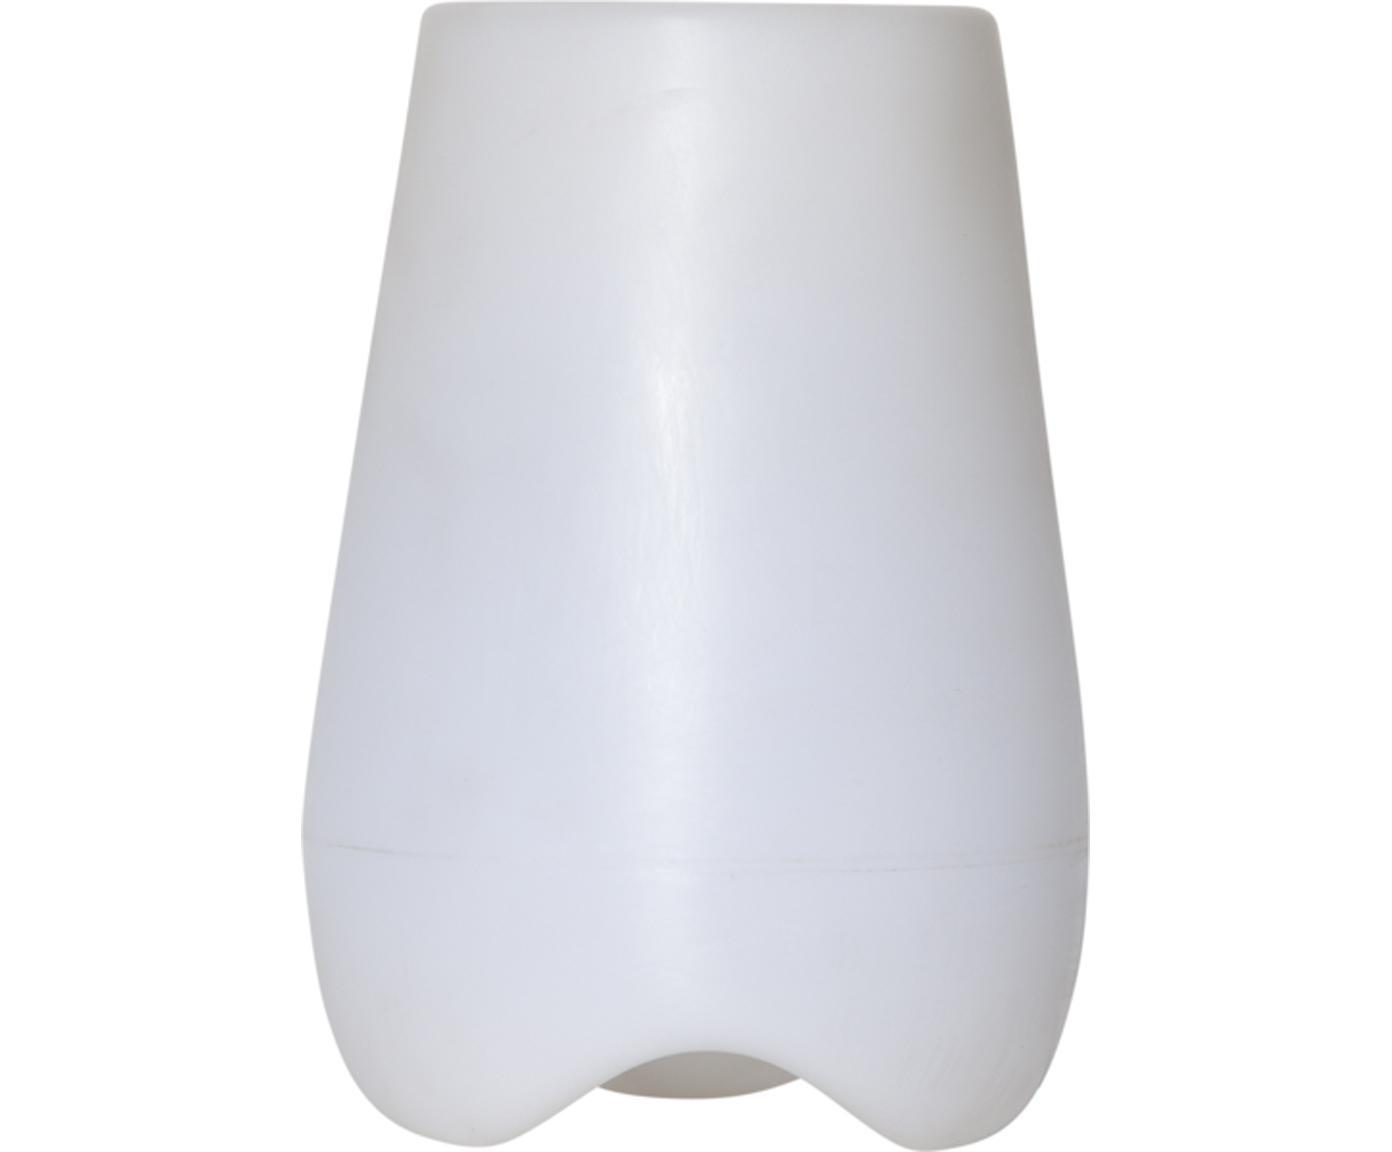 Lampada da esterno a LED Twilights, Materiale sintetico, Bianco, Ø 28 x Alt. 40 cm